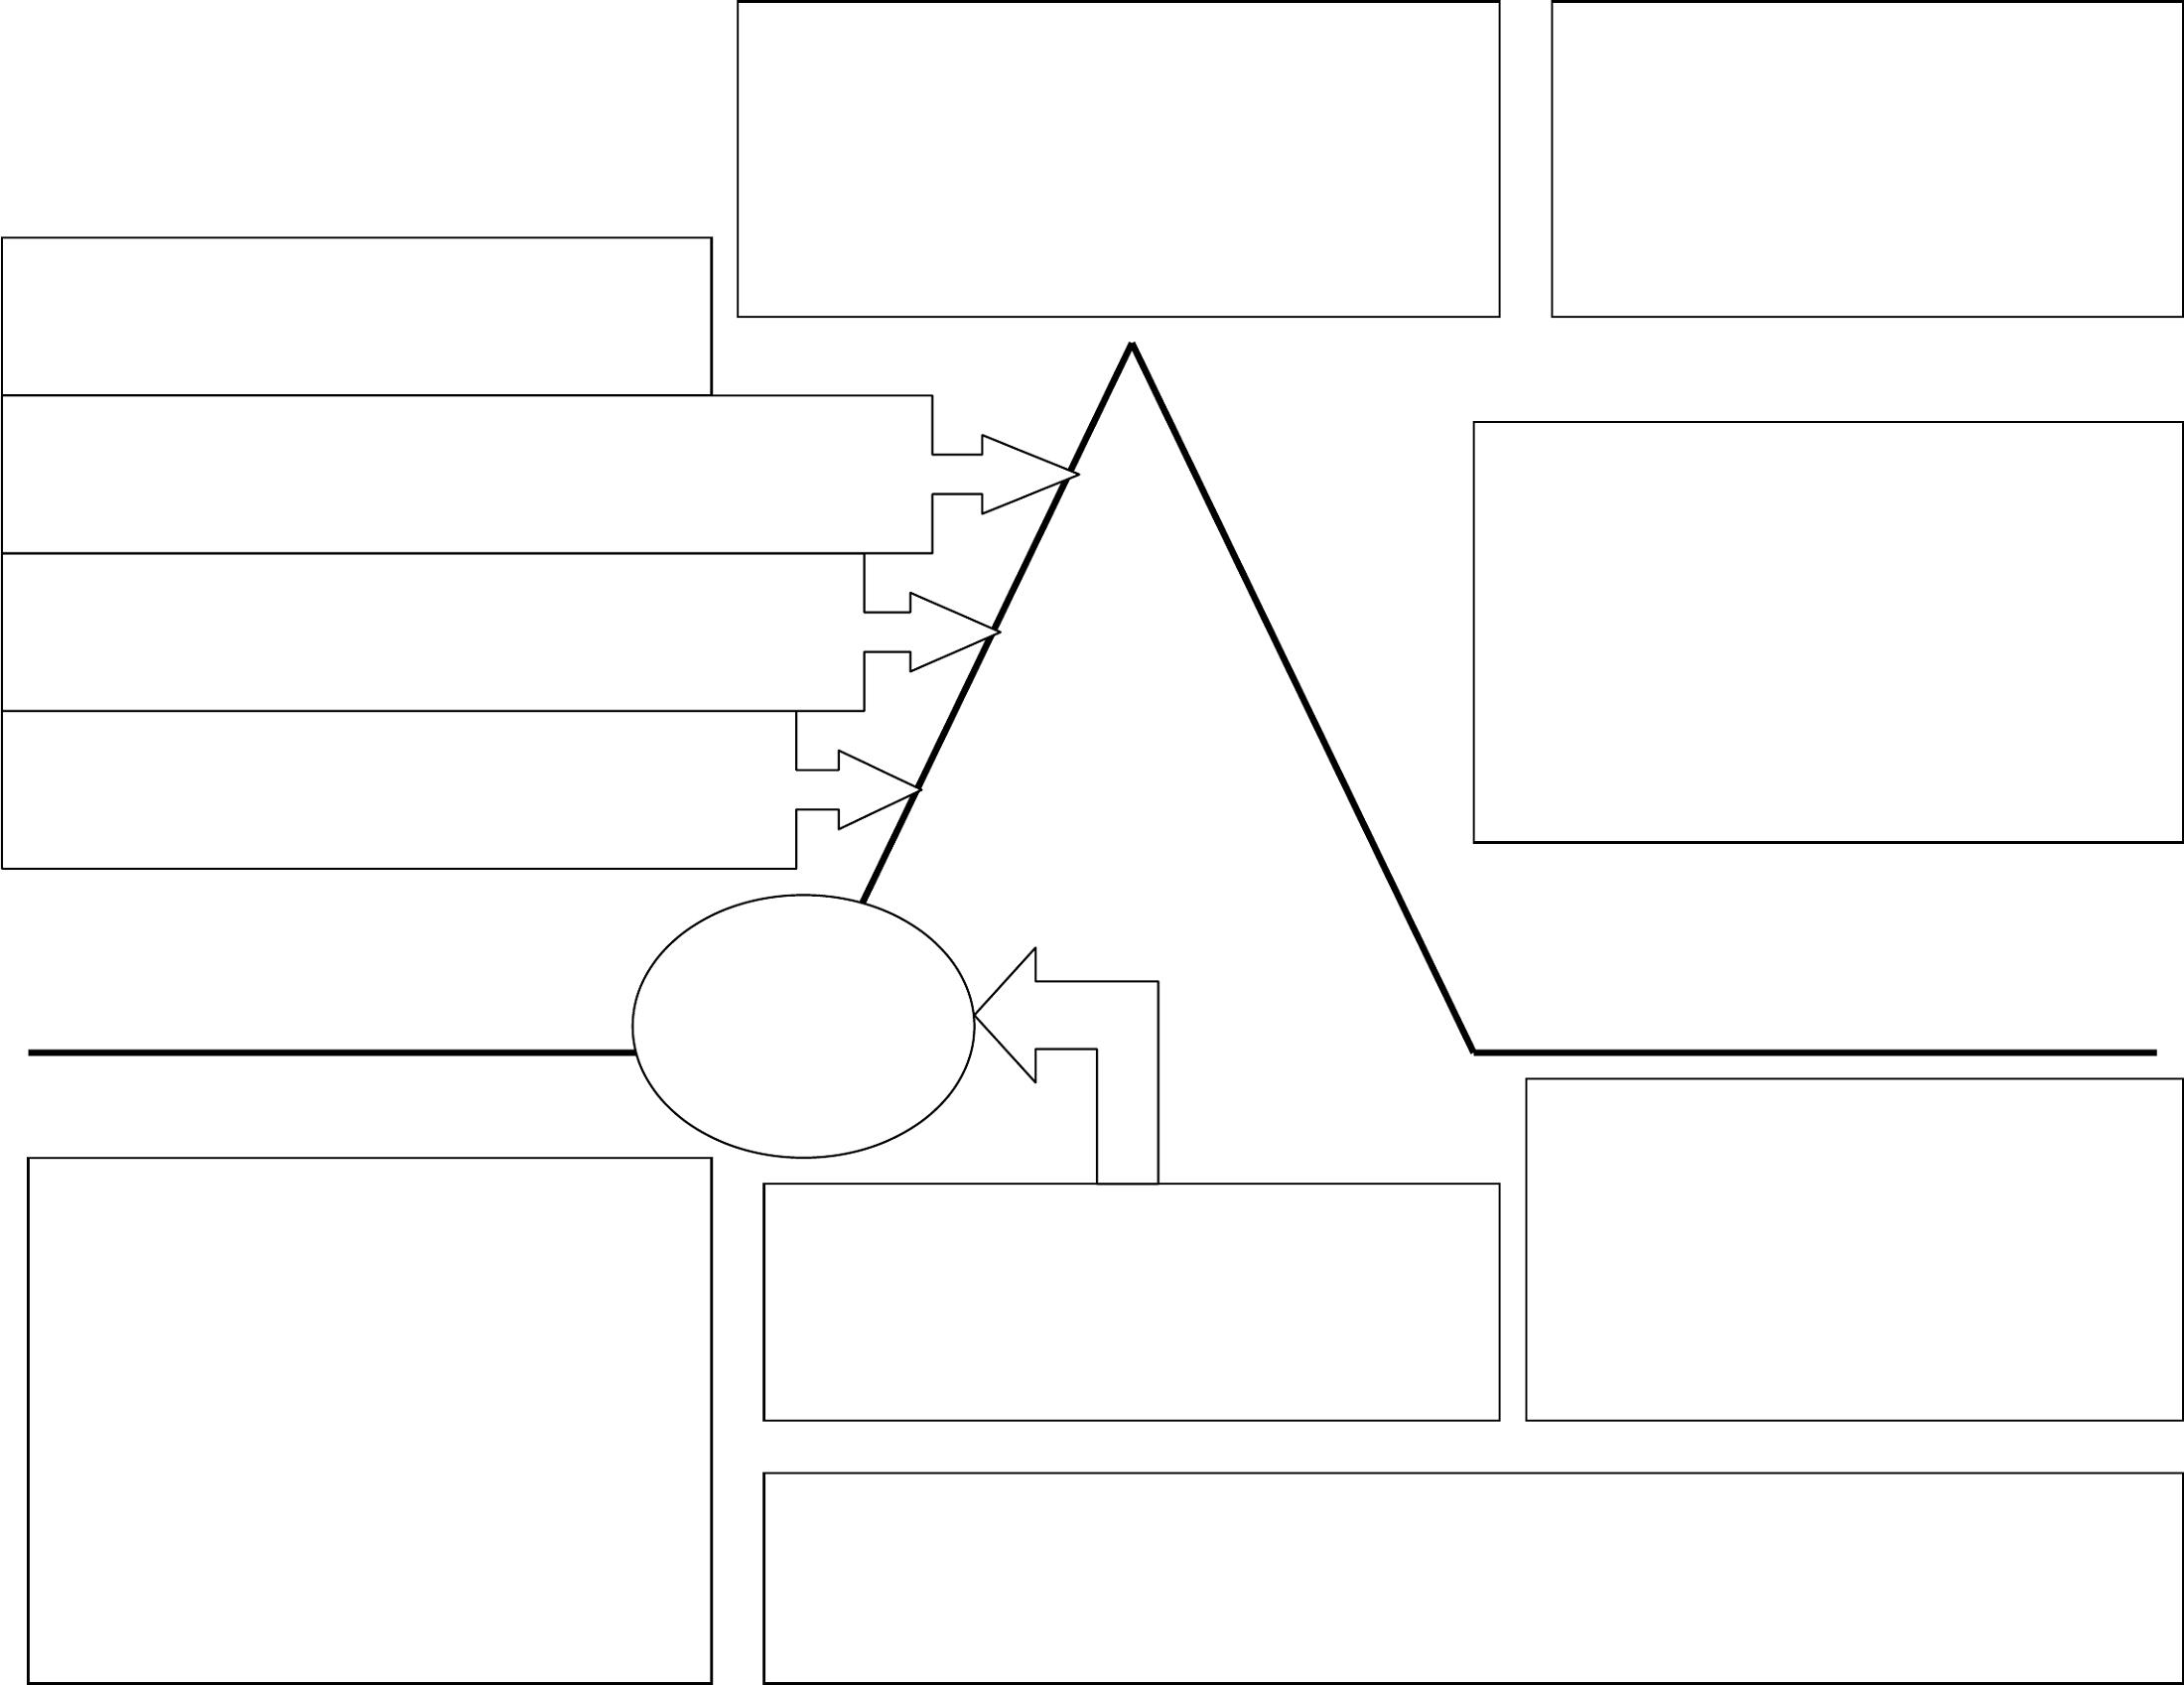 picture regarding Plot Diagram Template Printable referred to as Plot Diagram Template Printable Diagram Printable